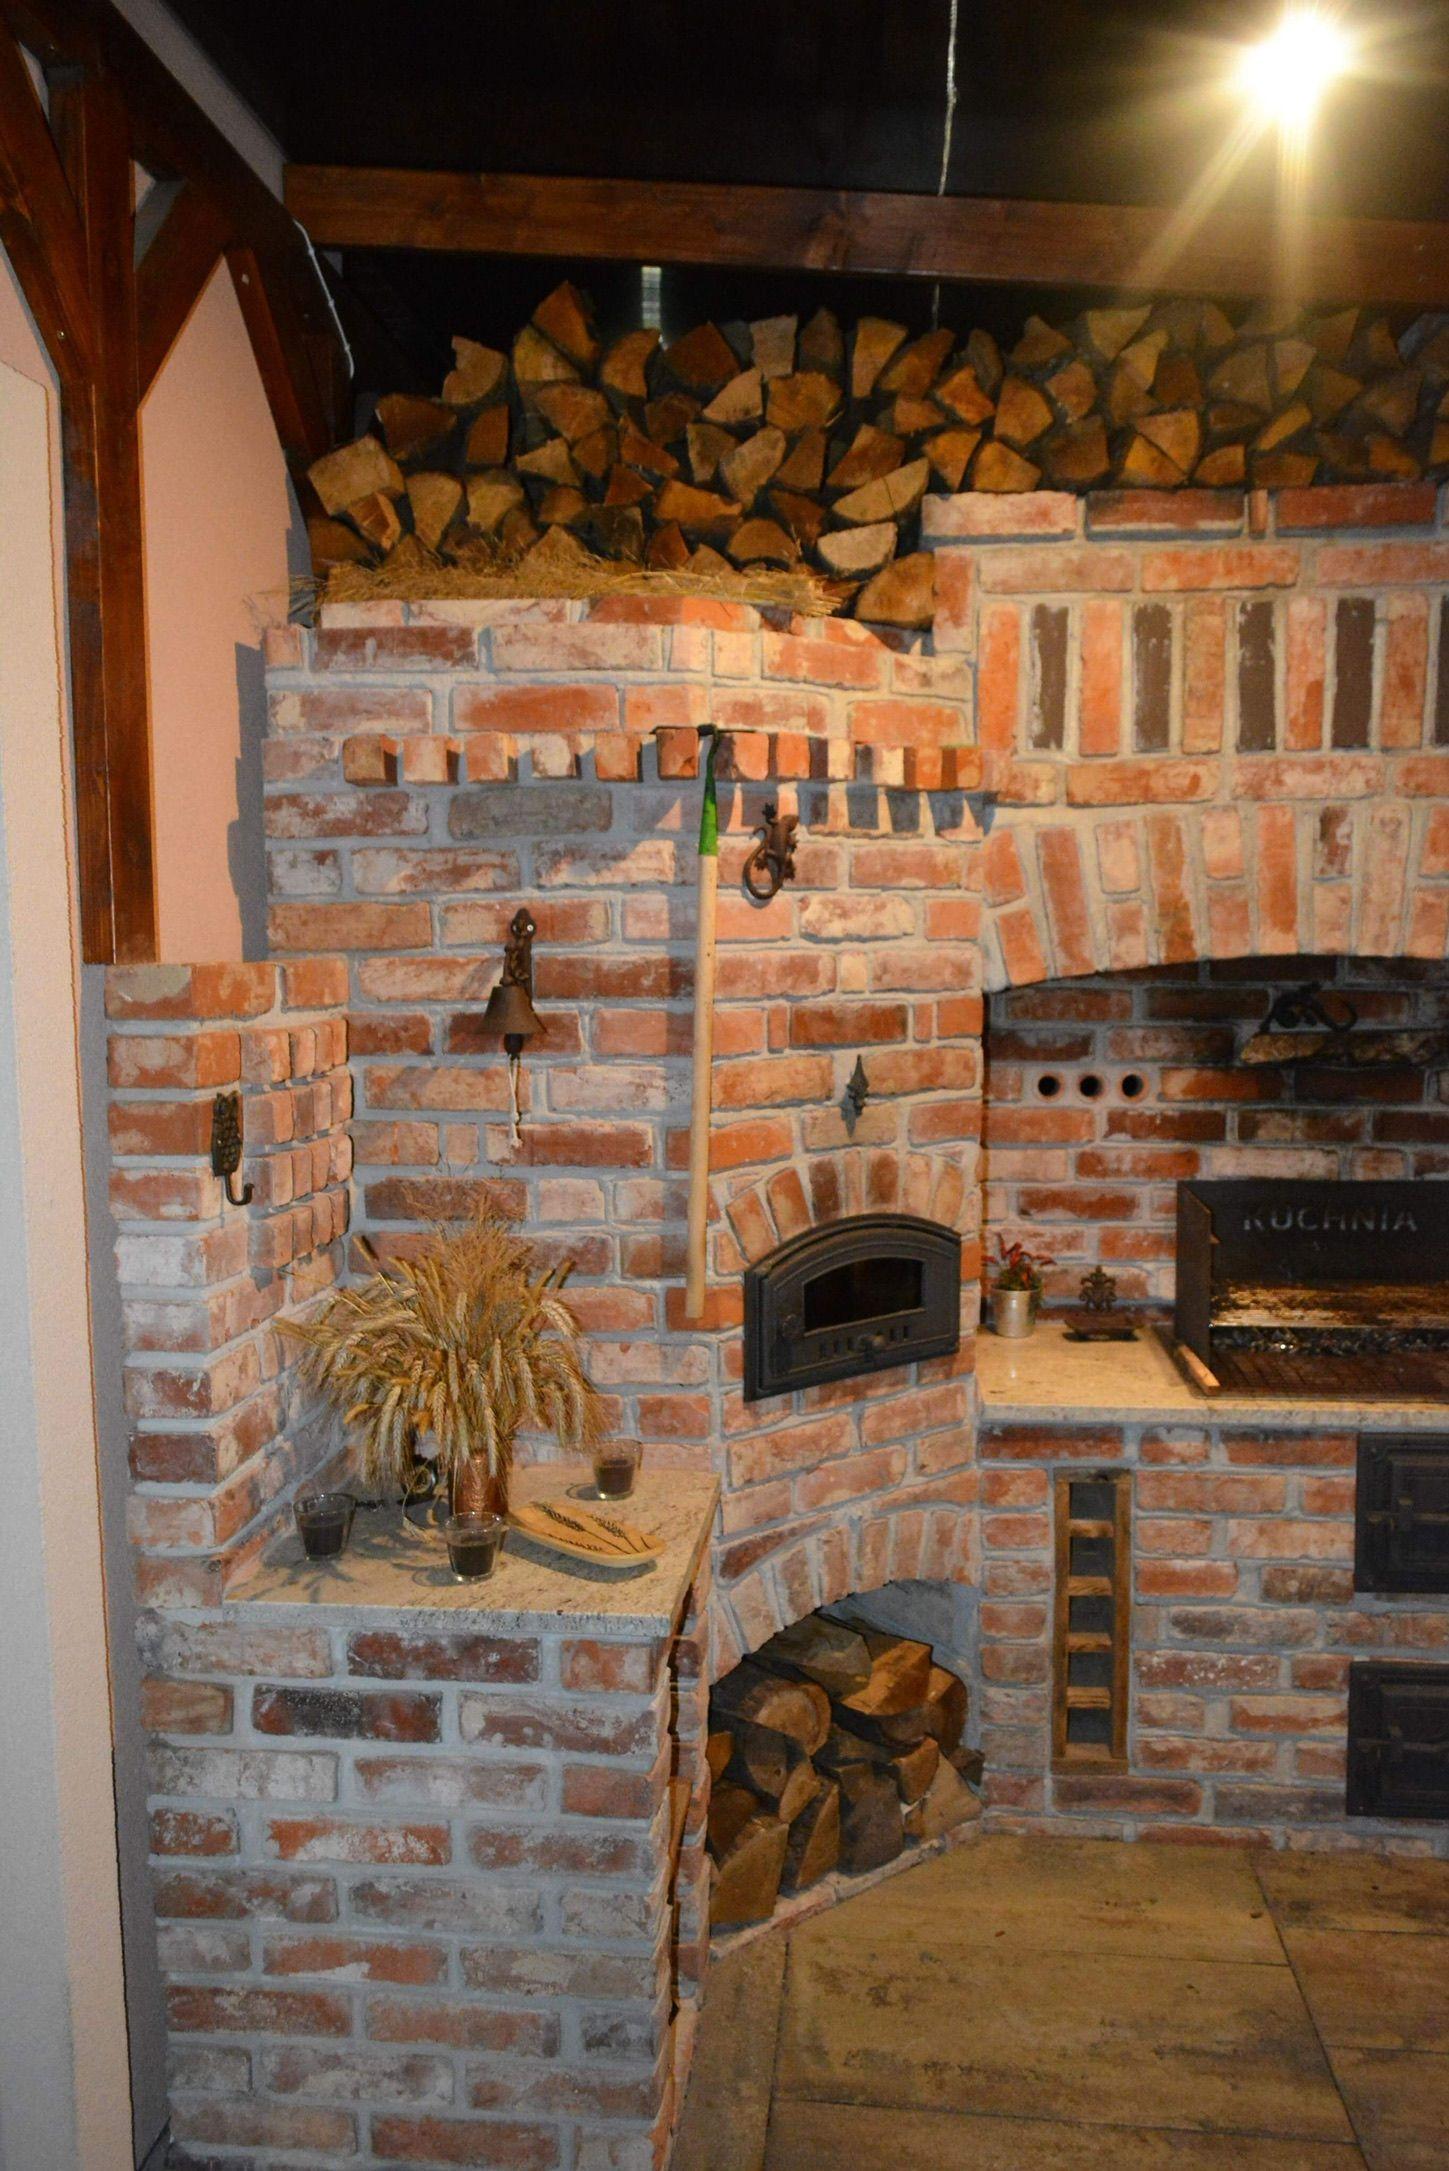 Kuchnia Letnia Ze Starej Cegly Canning Kitchen Summer Kitchen Bbq Pit